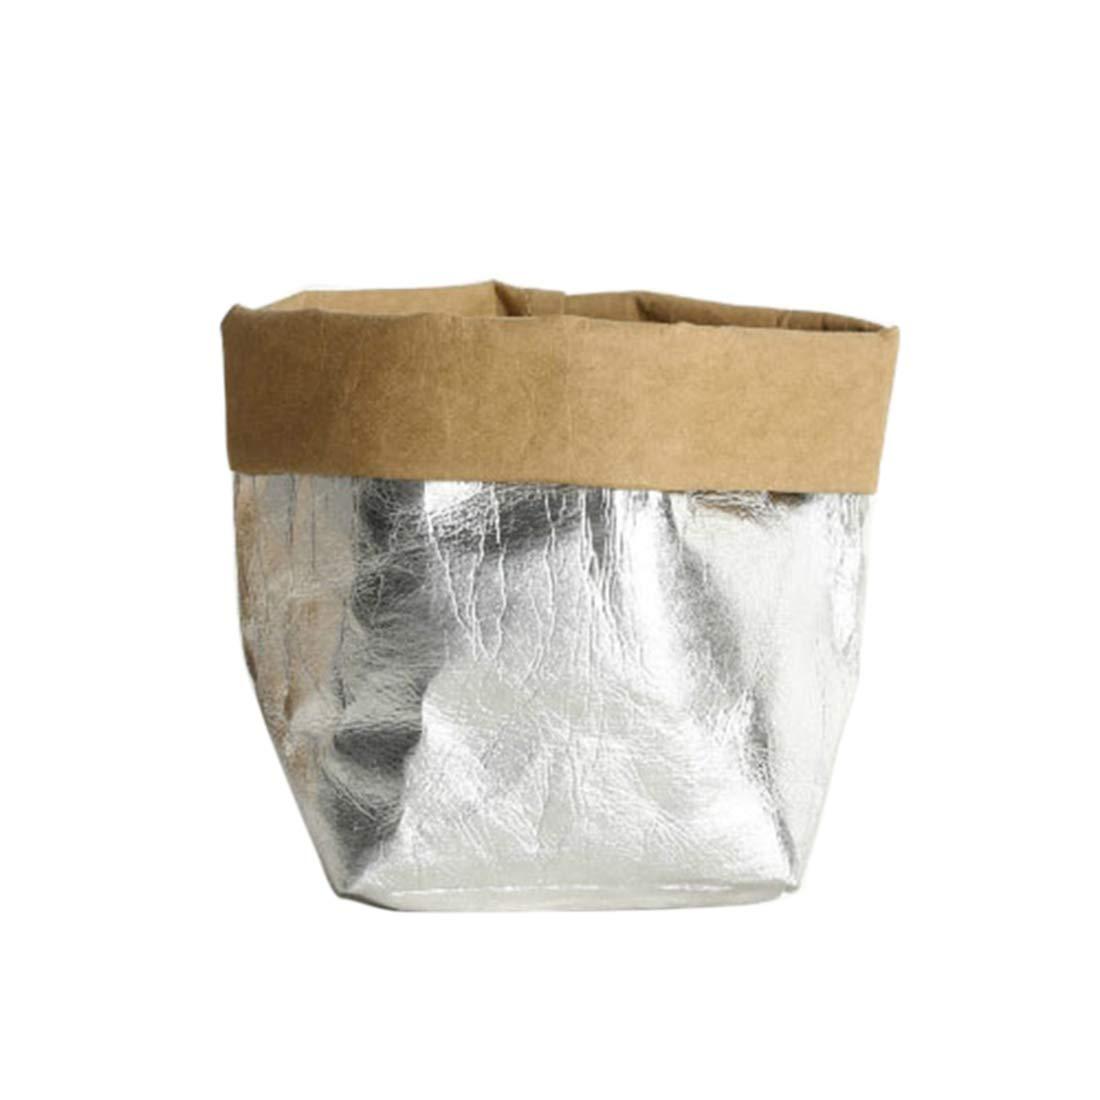 XINGYUE Washable Kraft Paper Bag Plant Flowers Pots Multifunction Home Storage Bag Reuse